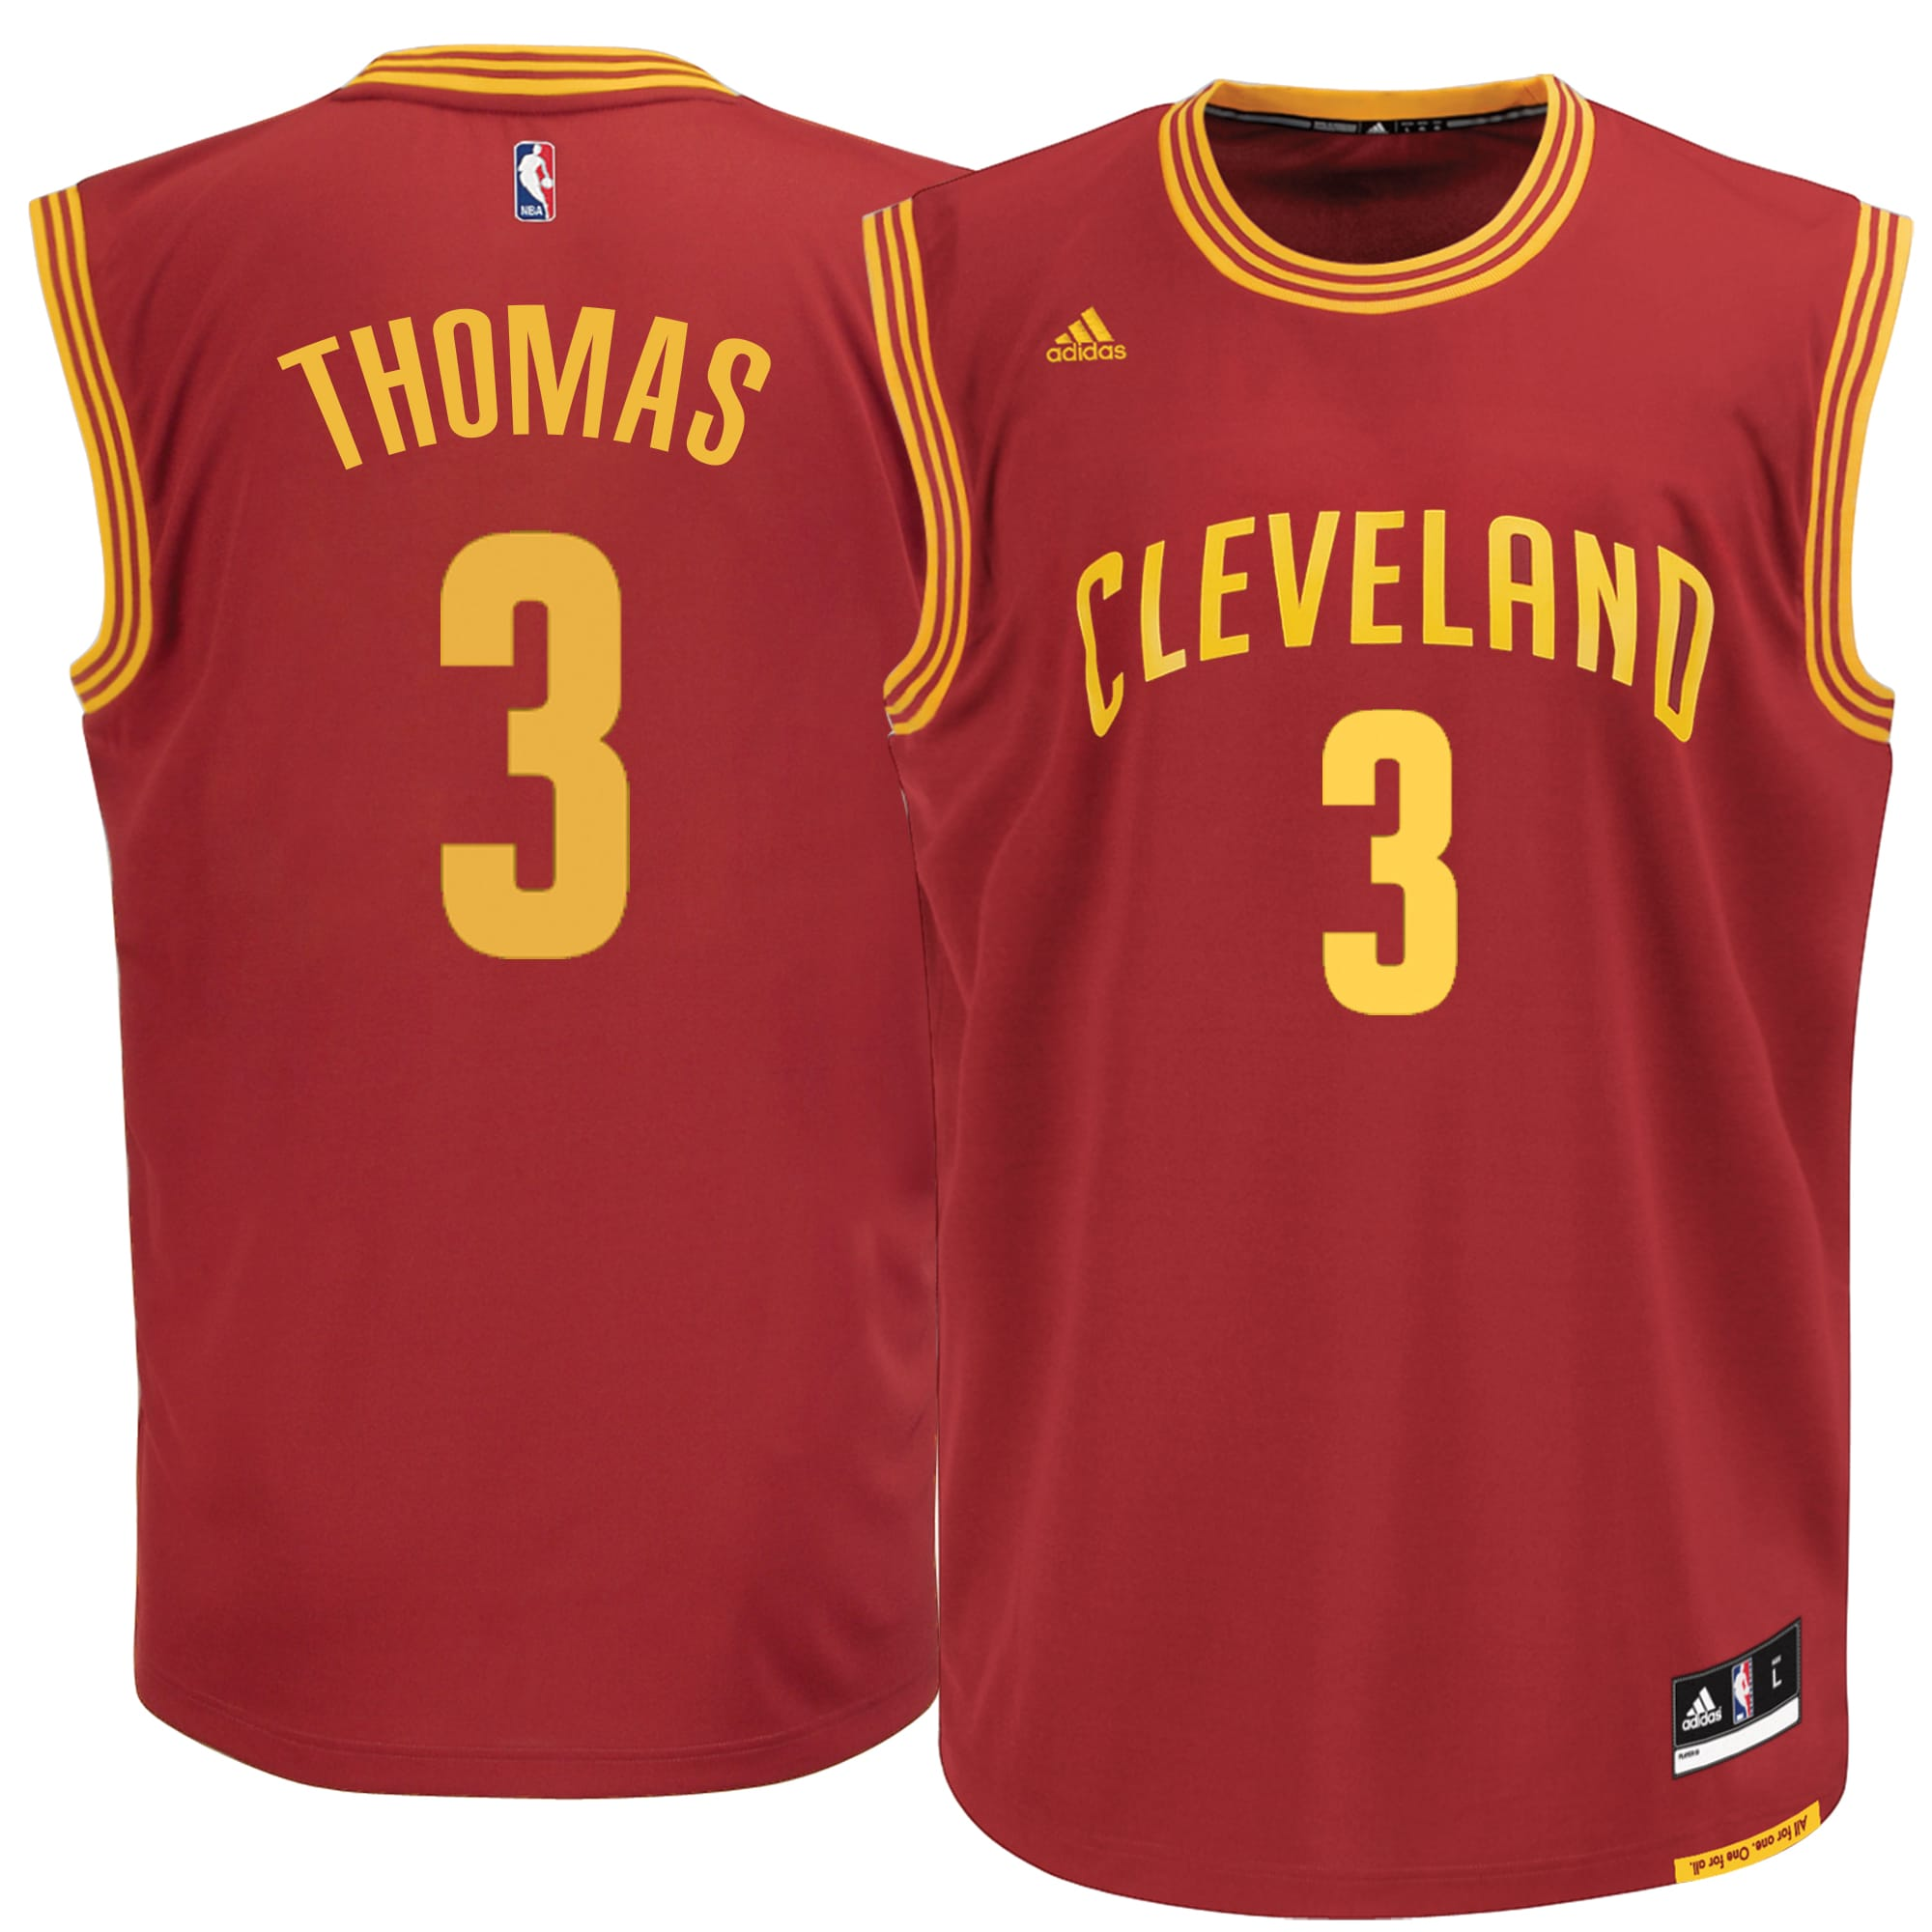 Isaiah Thomas Cleveland Cavaliers adidas Road Replica Jersey - Burgundy